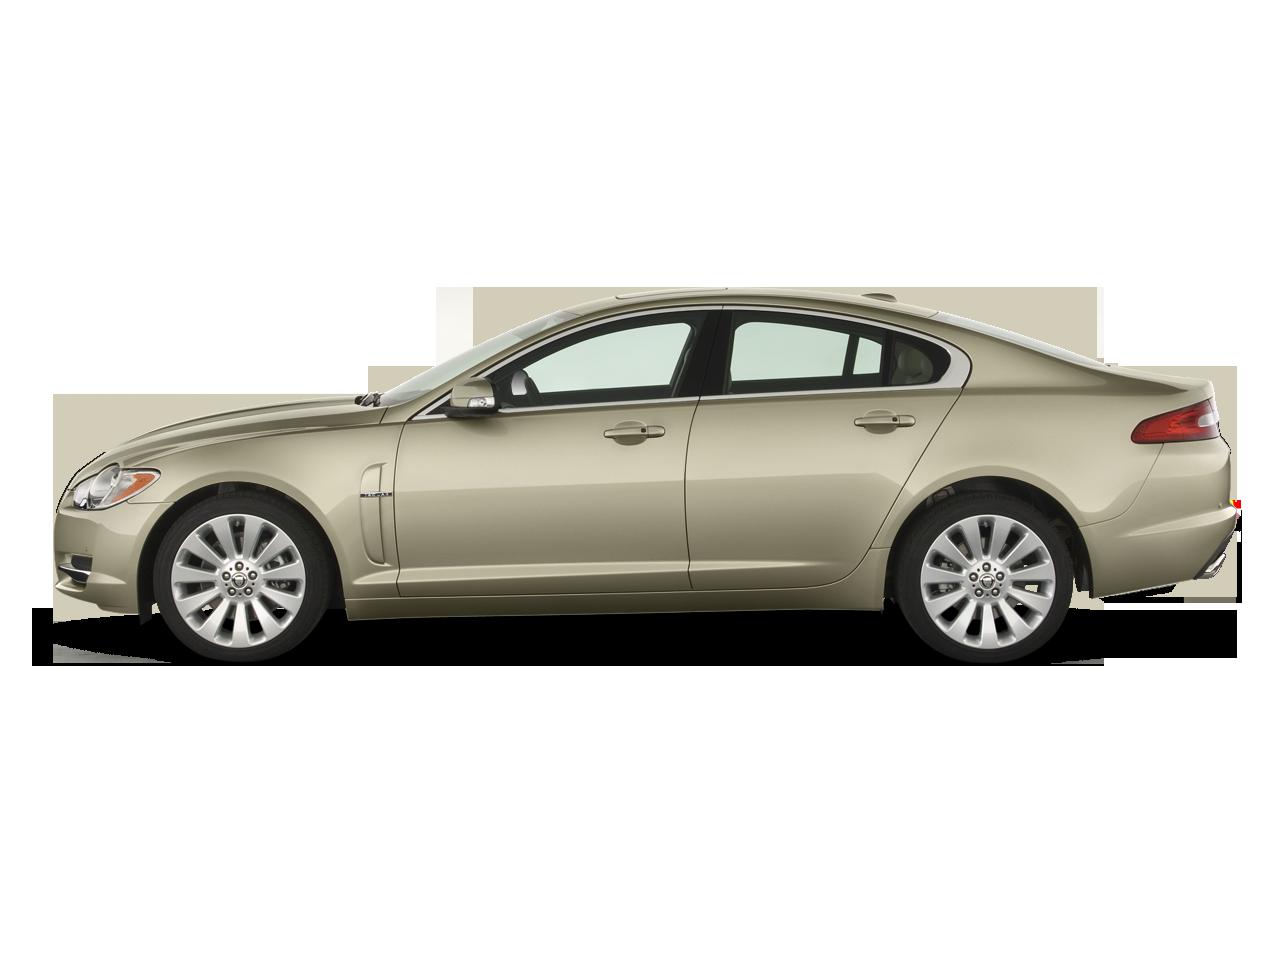 2009 jaguar xf jaguar luxury sedan review automobile magazine. Black Bedroom Furniture Sets. Home Design Ideas